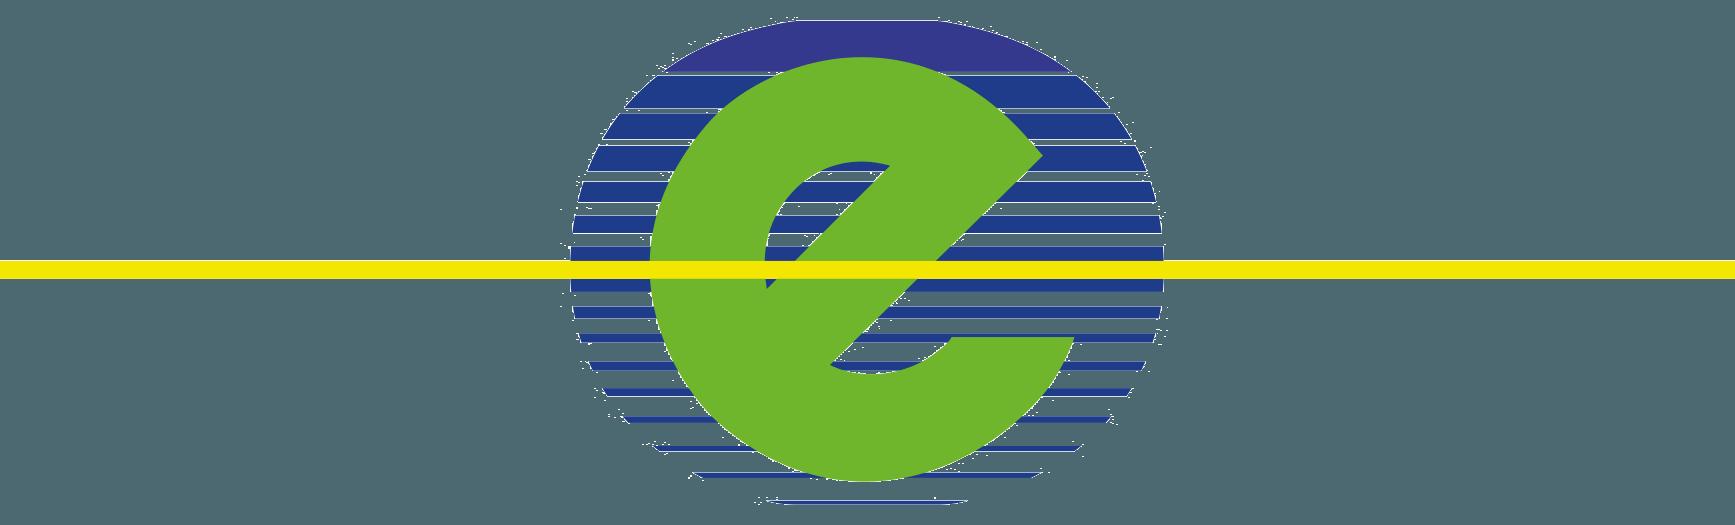 Nitrogen Oxide (NO, NO2, Nox) Analyzers   Eco Physics, Inc